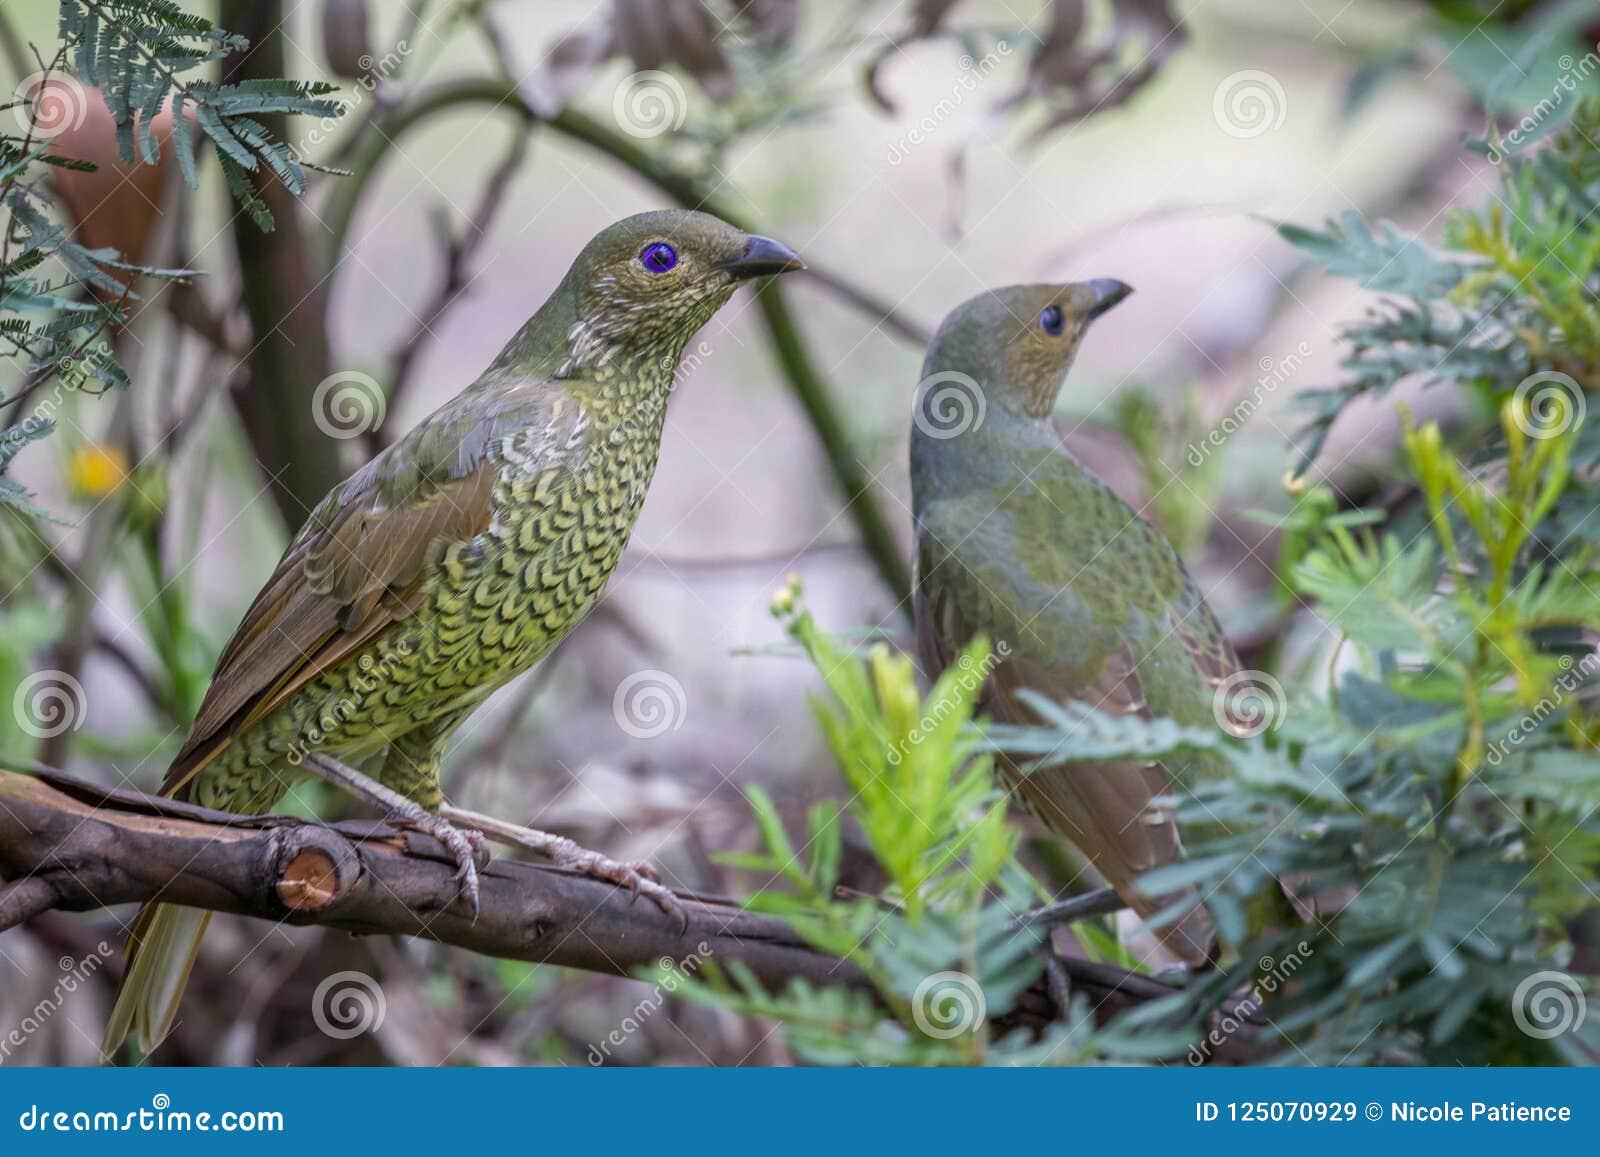 Wild Satin Bower Bird, Queen Mary Falls, Queensland, Australia, March 2018